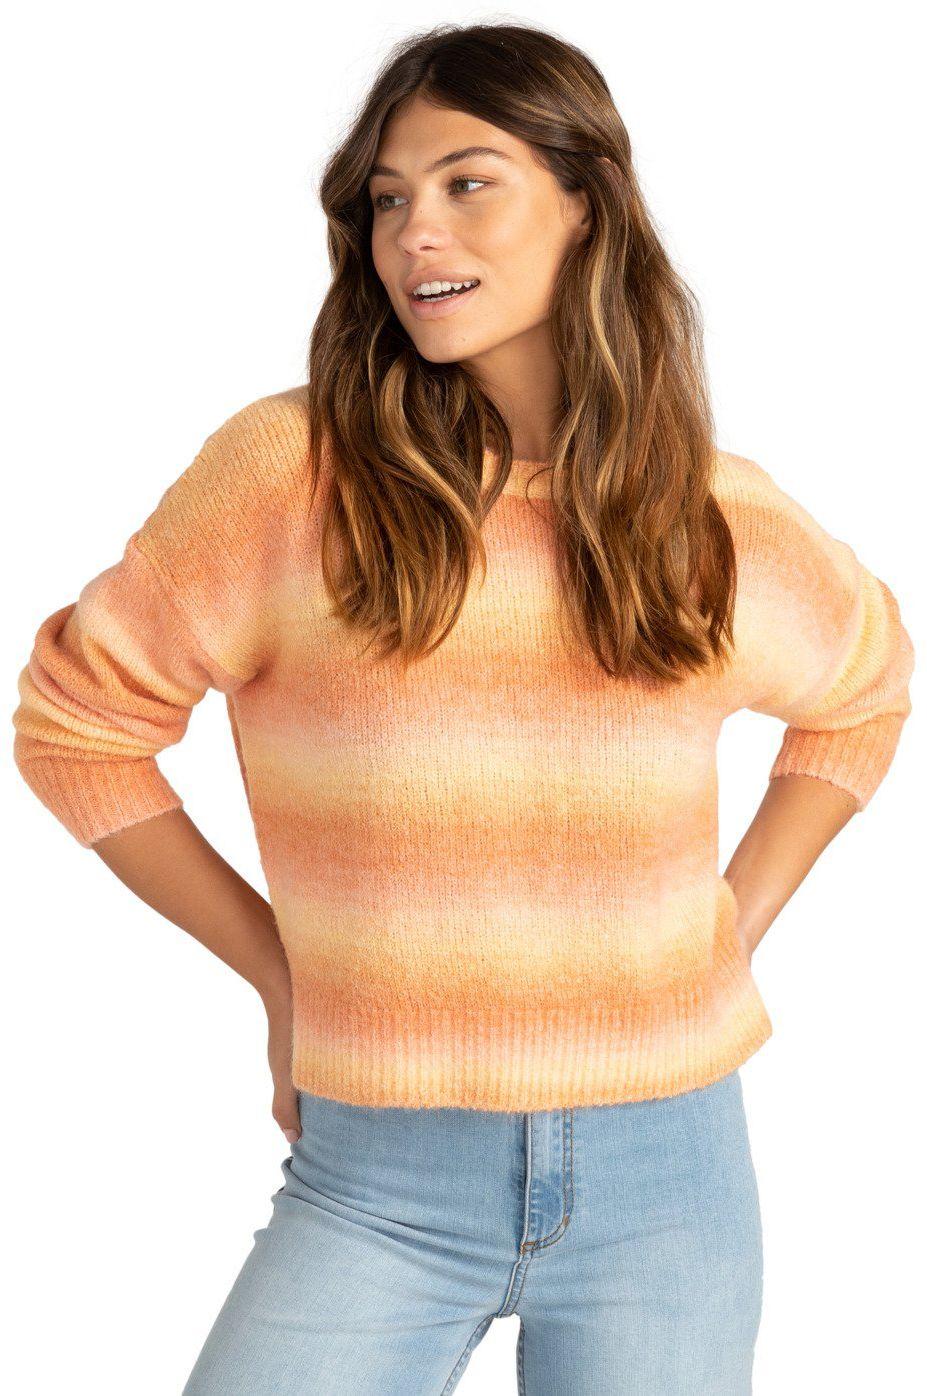 Billabong Sweater OVER THE RAINBOW PARADISE FOUND Caramel